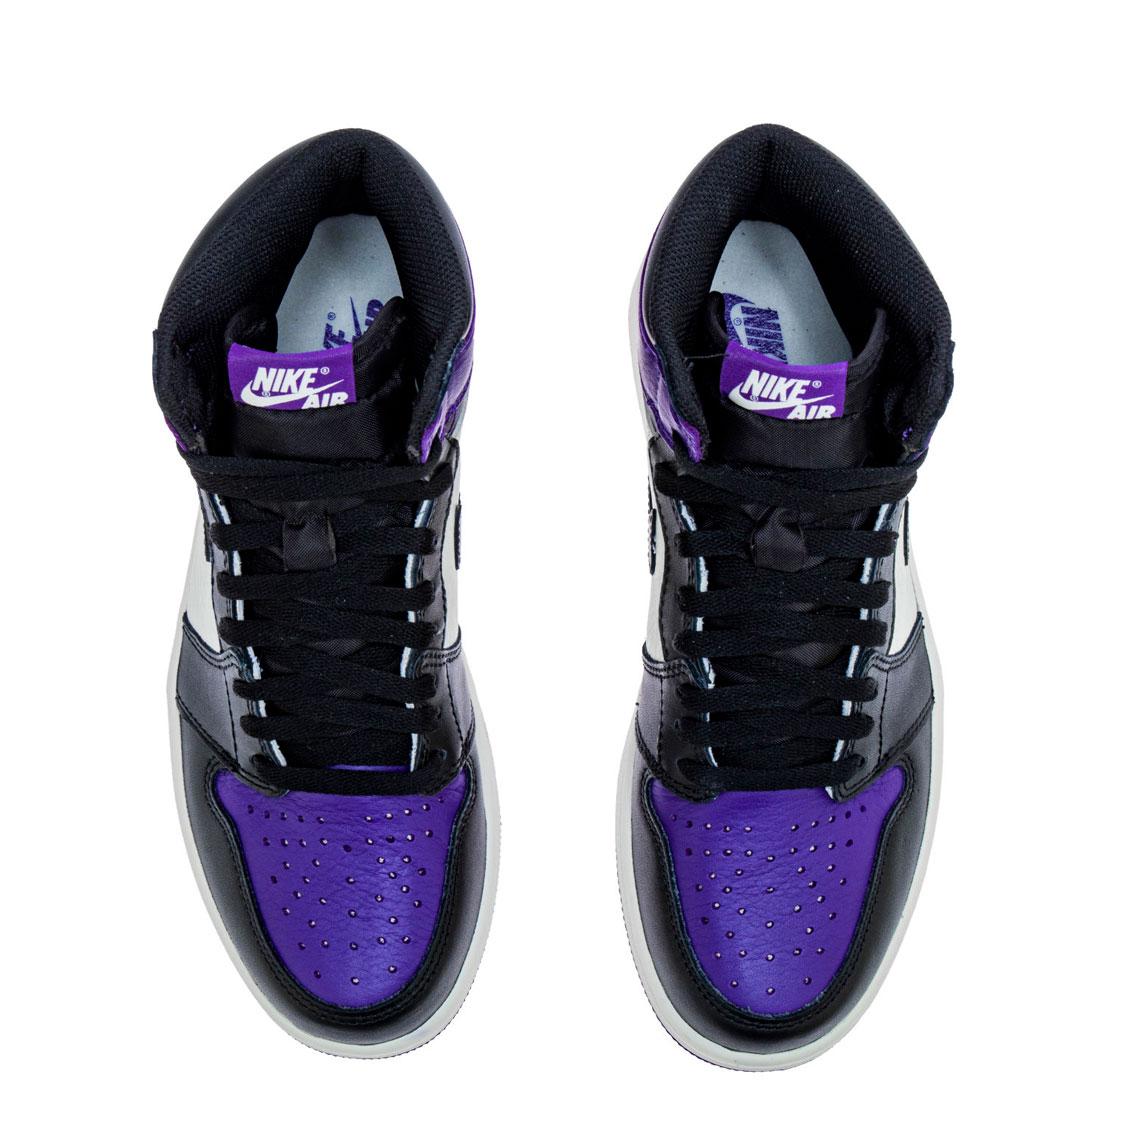 9c7025836739 Air Jordan 1 Retro High OG Court Purple Photos